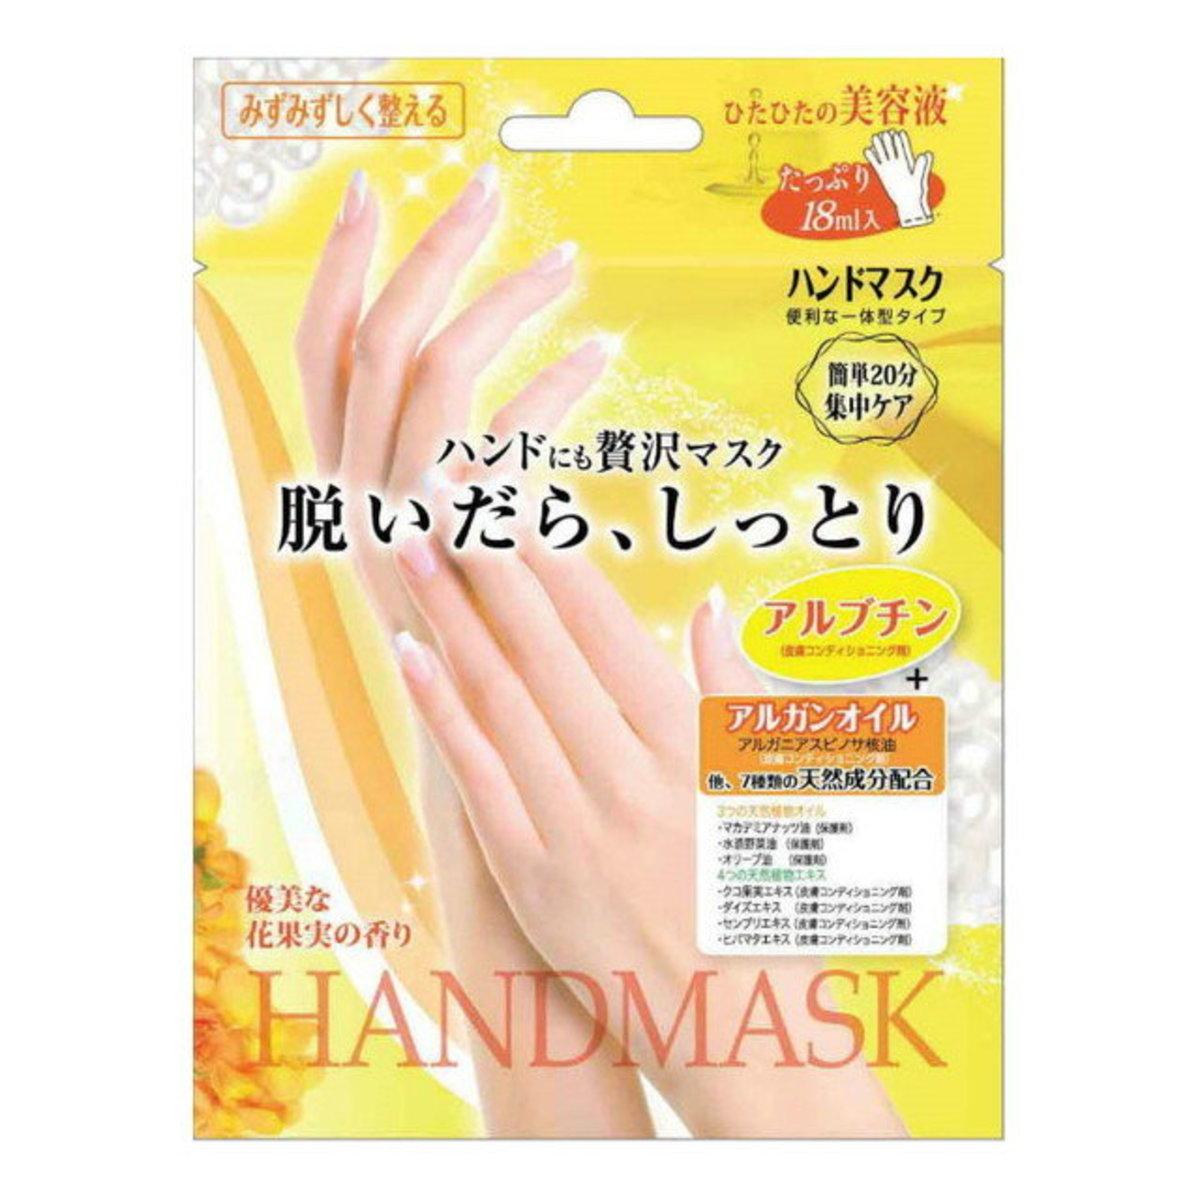 Beauty World - Moisturize Hand Mask 18ml (Parallel Imports)